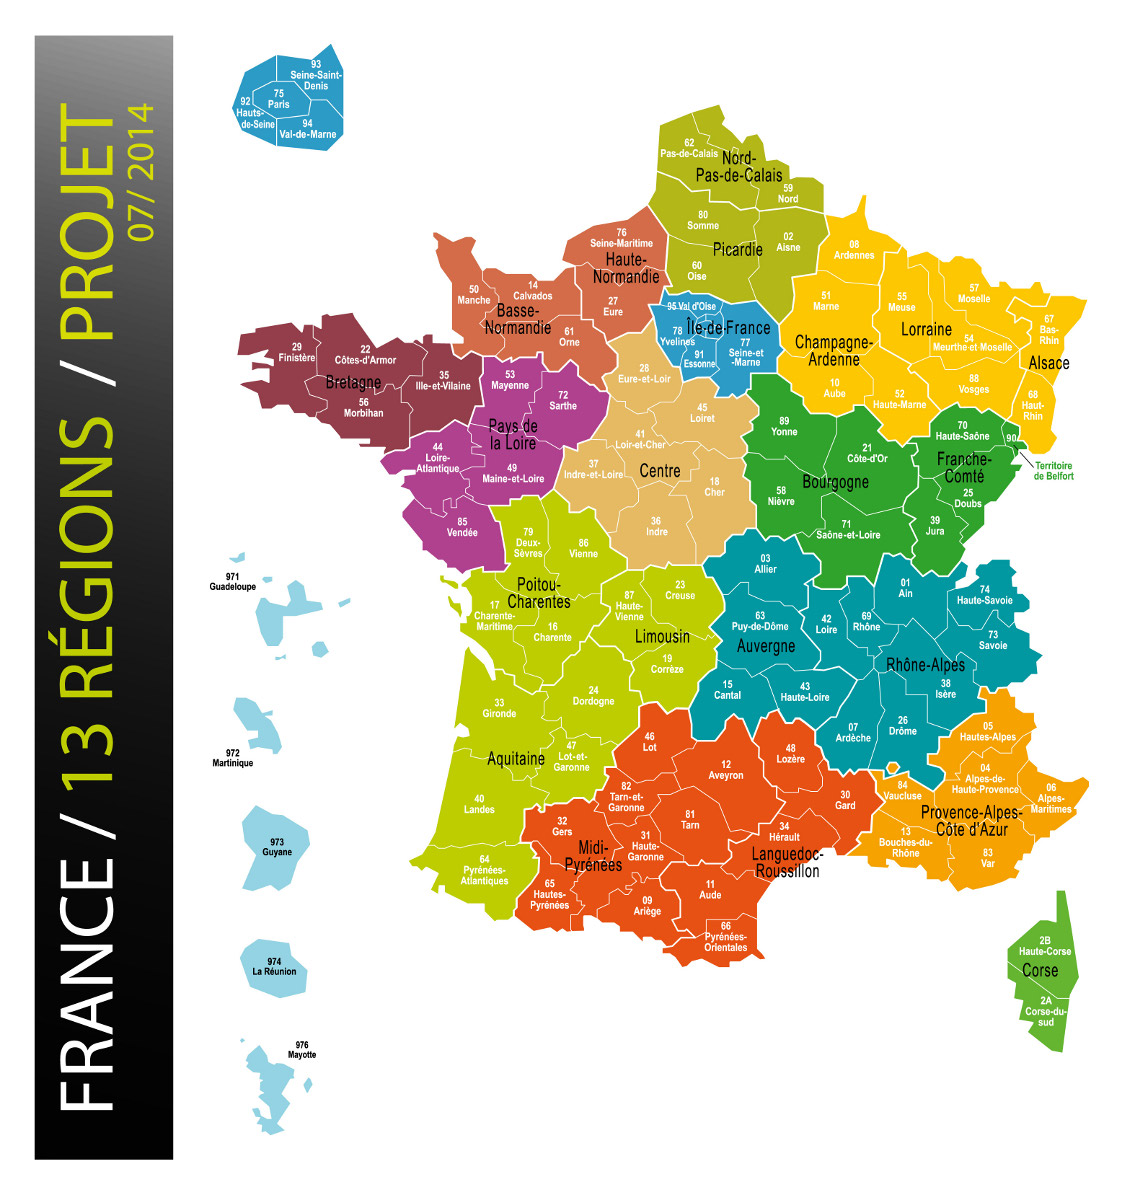 13 regions - Photo